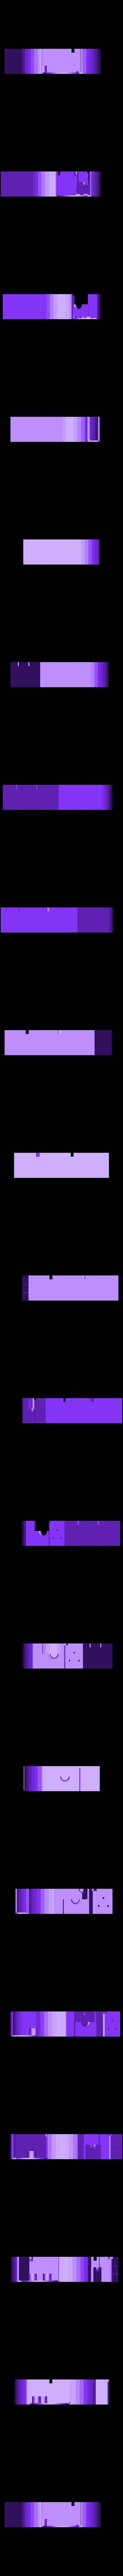 Lateral_case.stl Download free STL file Bubbles! • 3D printer object, Zippityboomba